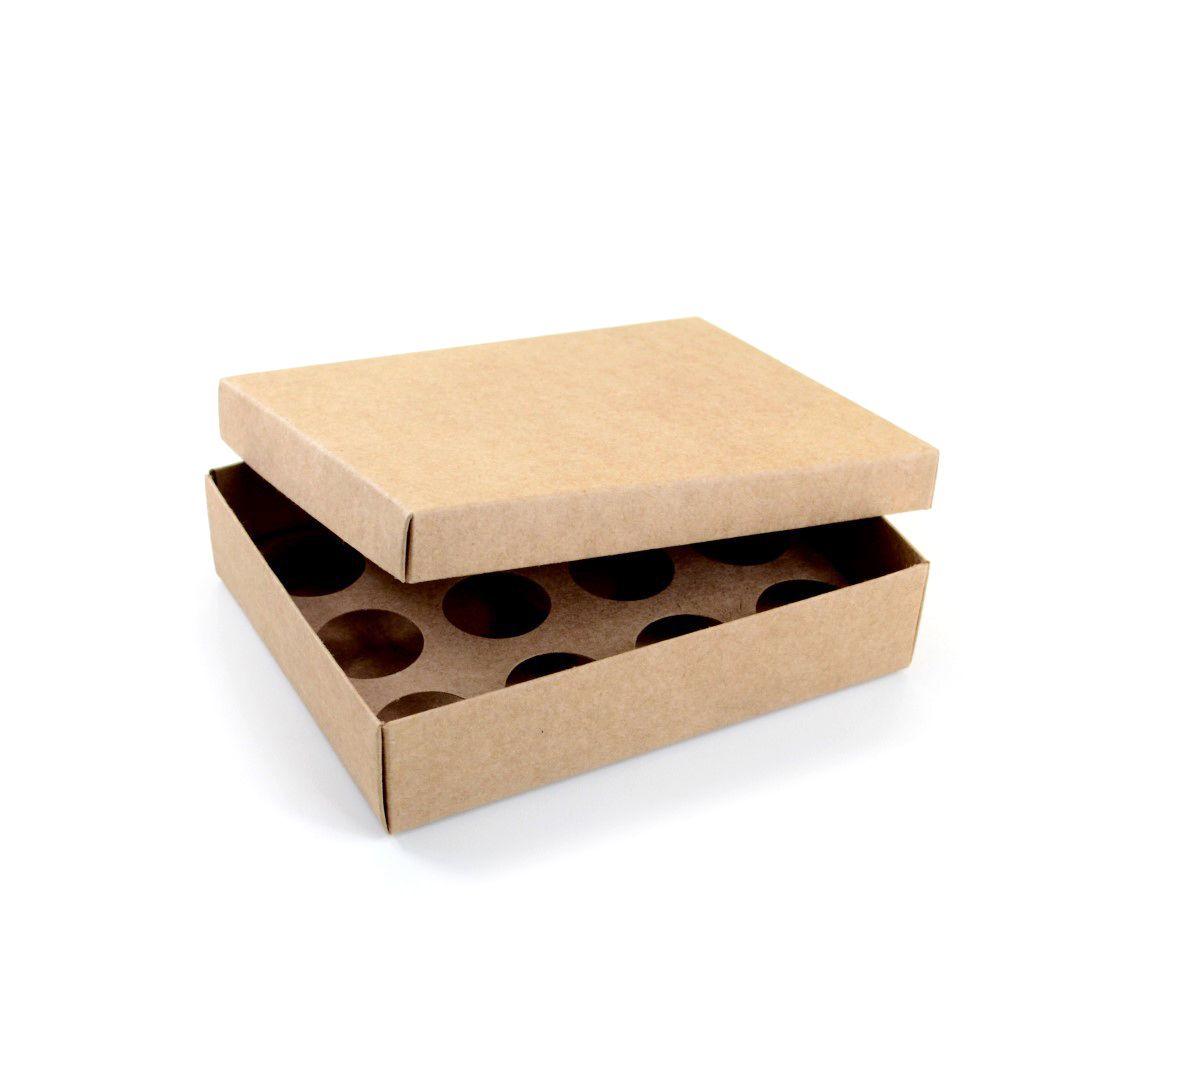 Ref 043 Kraft - Caixa p/ 12 Brigadeiro Gourmet Nº4 - c/ tampa papel - 17x13x4 cm - c/ 10 unidades